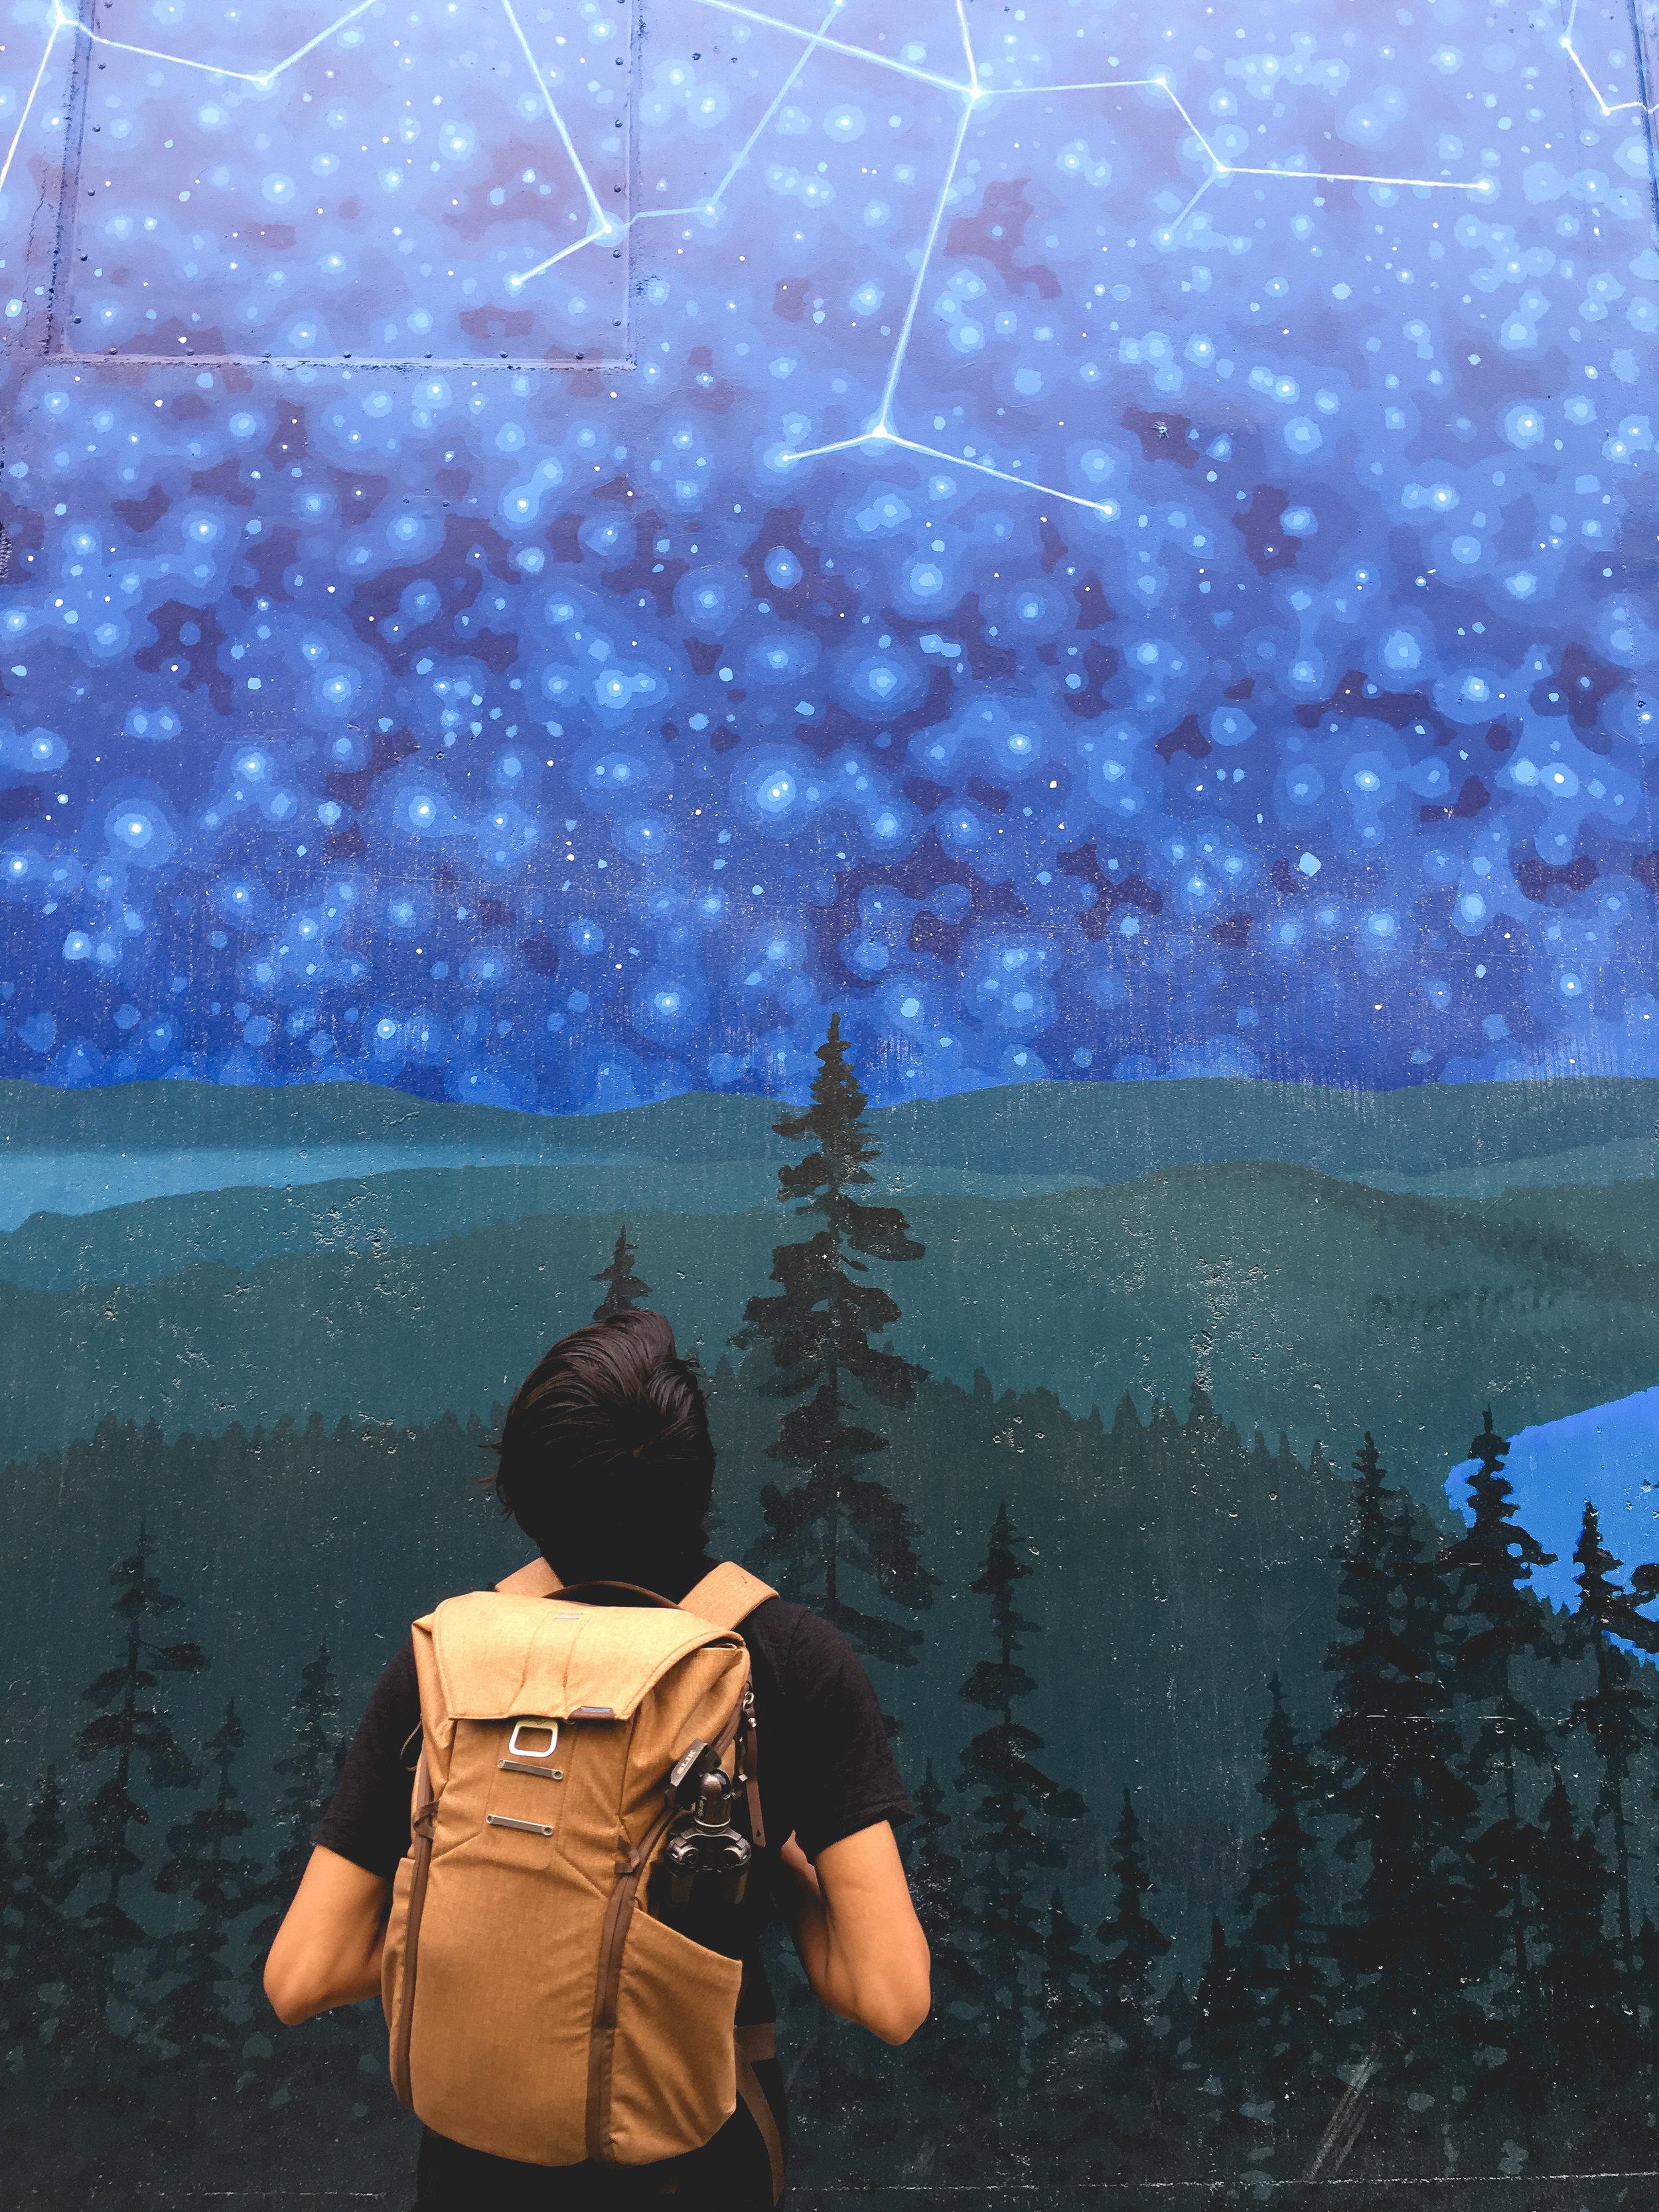 portland-starry-sky-mural